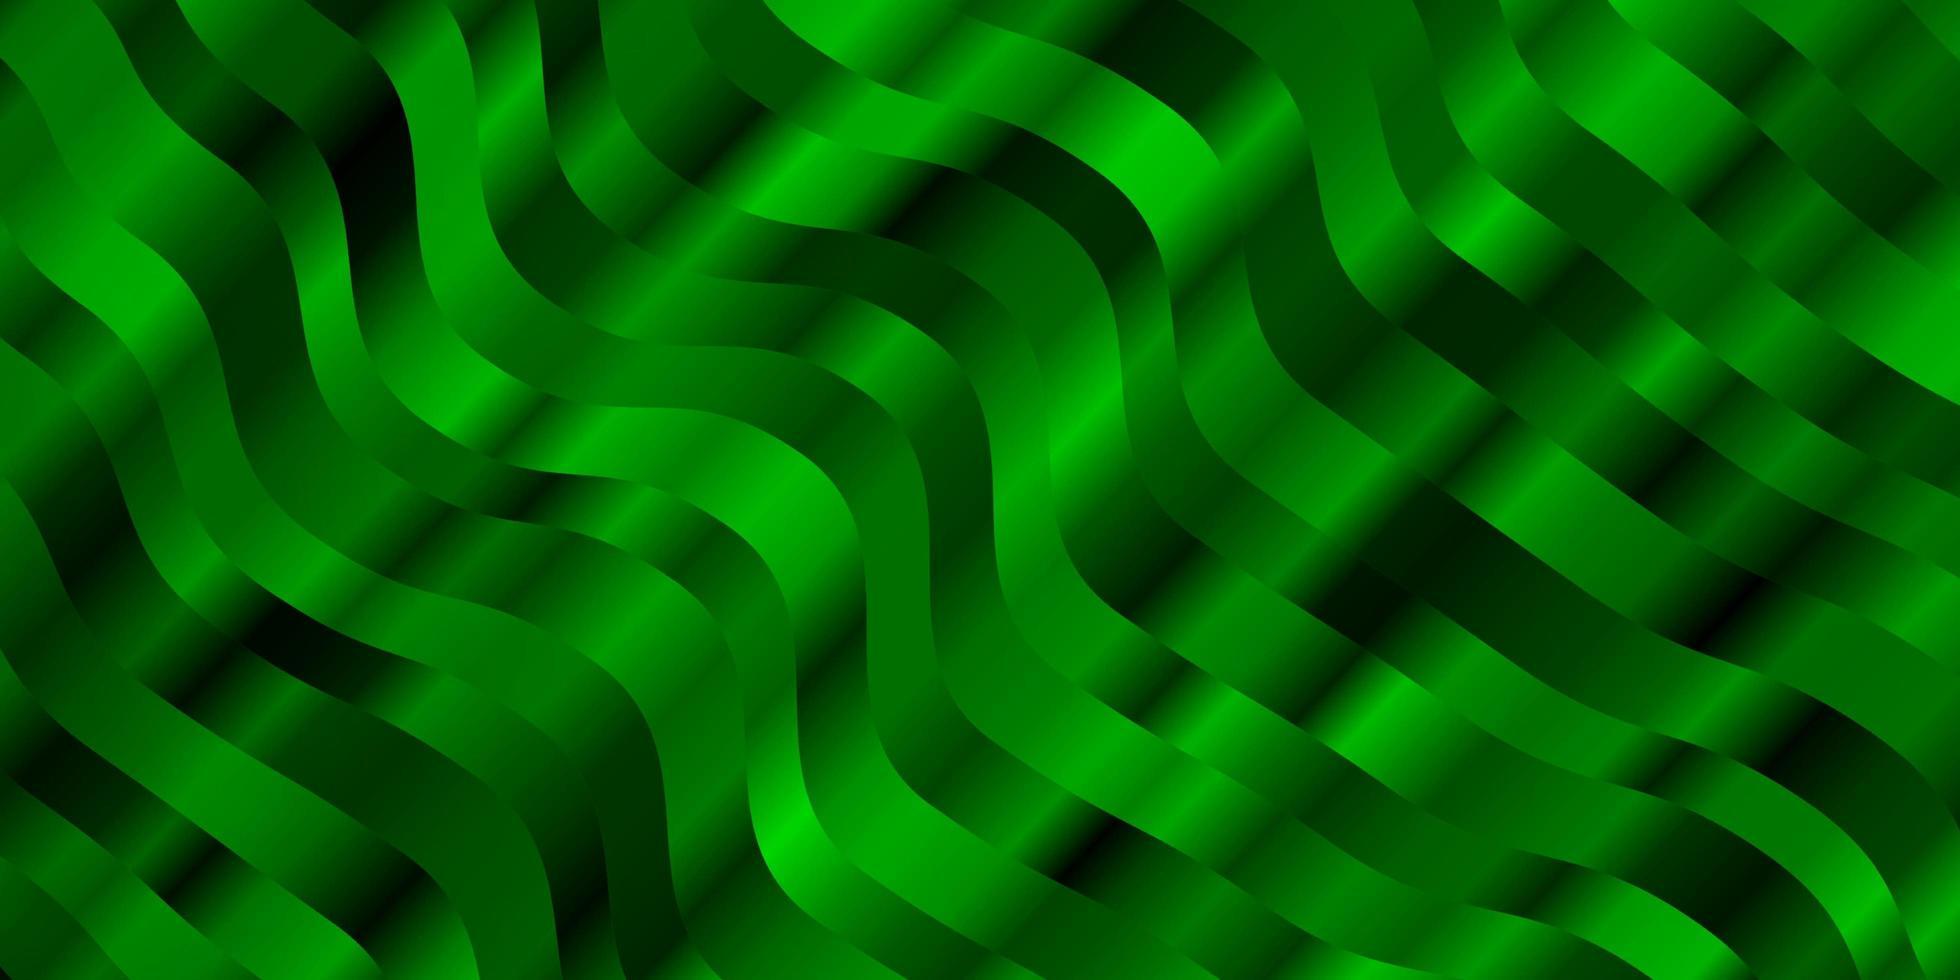 grünes Muster mit Kurven. vektor